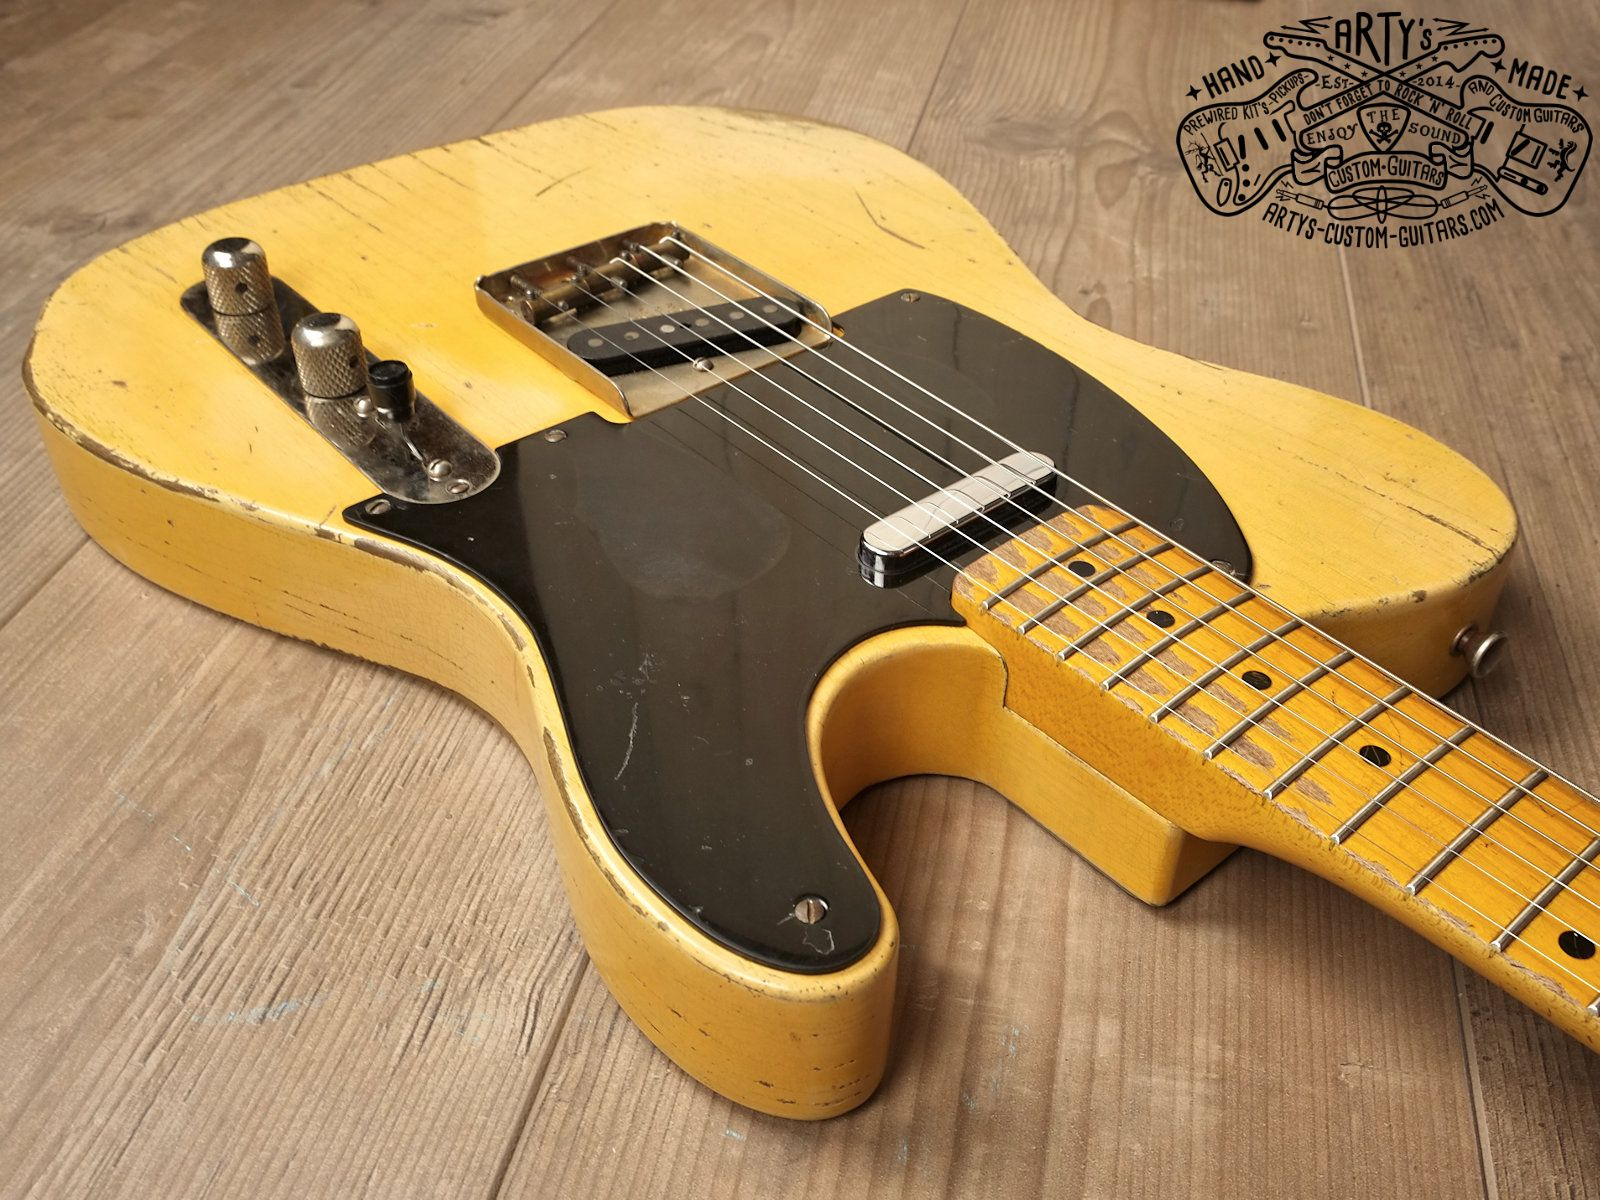 medium resolution of broadcaster butterscotch blonde telecaster heavy relic tele maple neck swamp ash body bakelite pickguard aged nitro finish arty s custom guitars